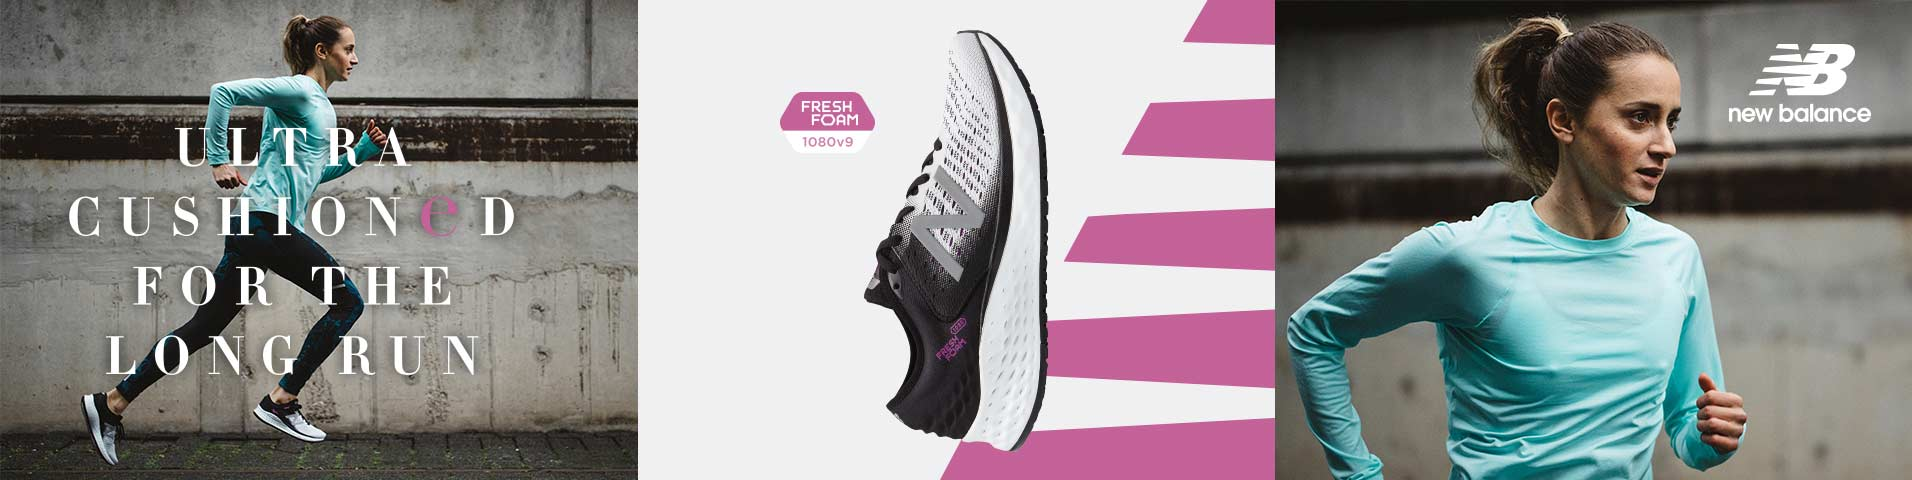 chaussure new balance femme zalando